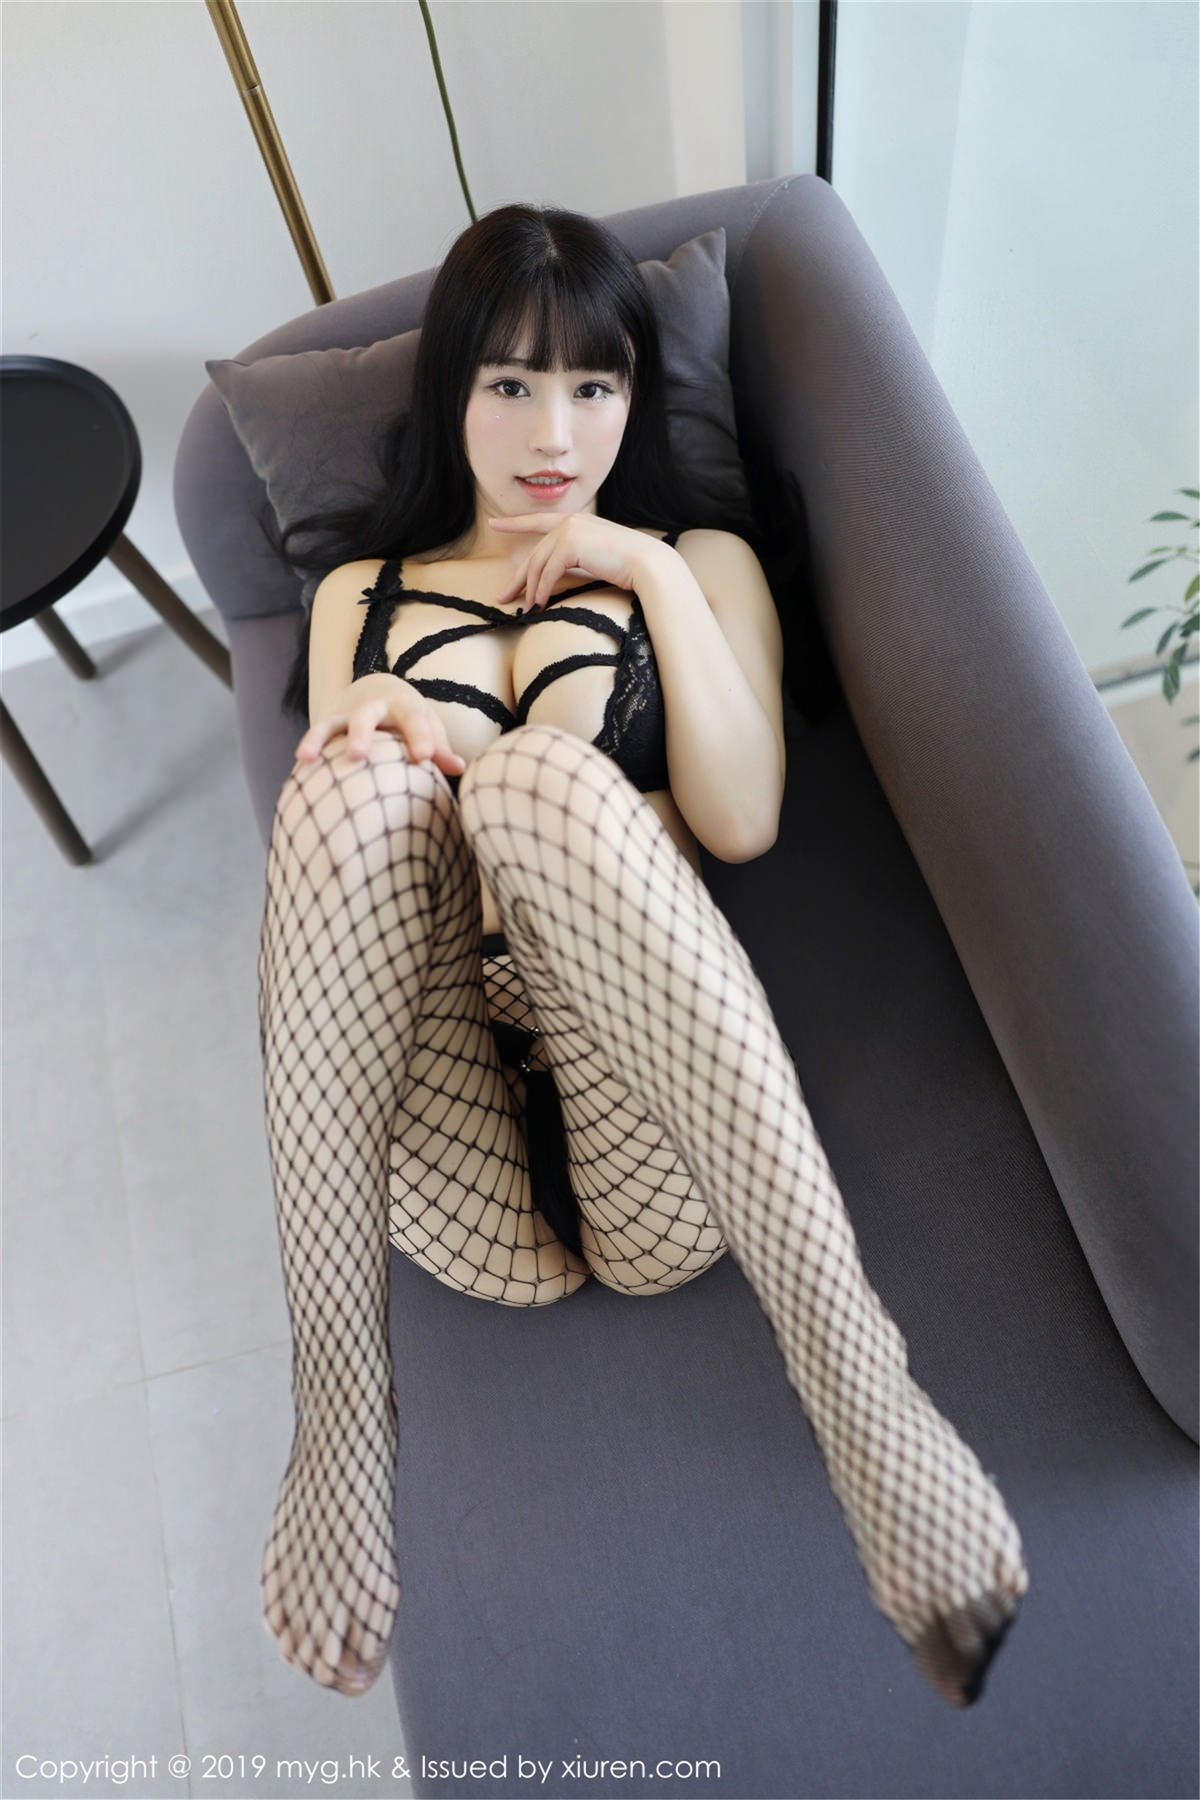 MyGirl Vol.357 22P, mygirl, Zhu Ke Er